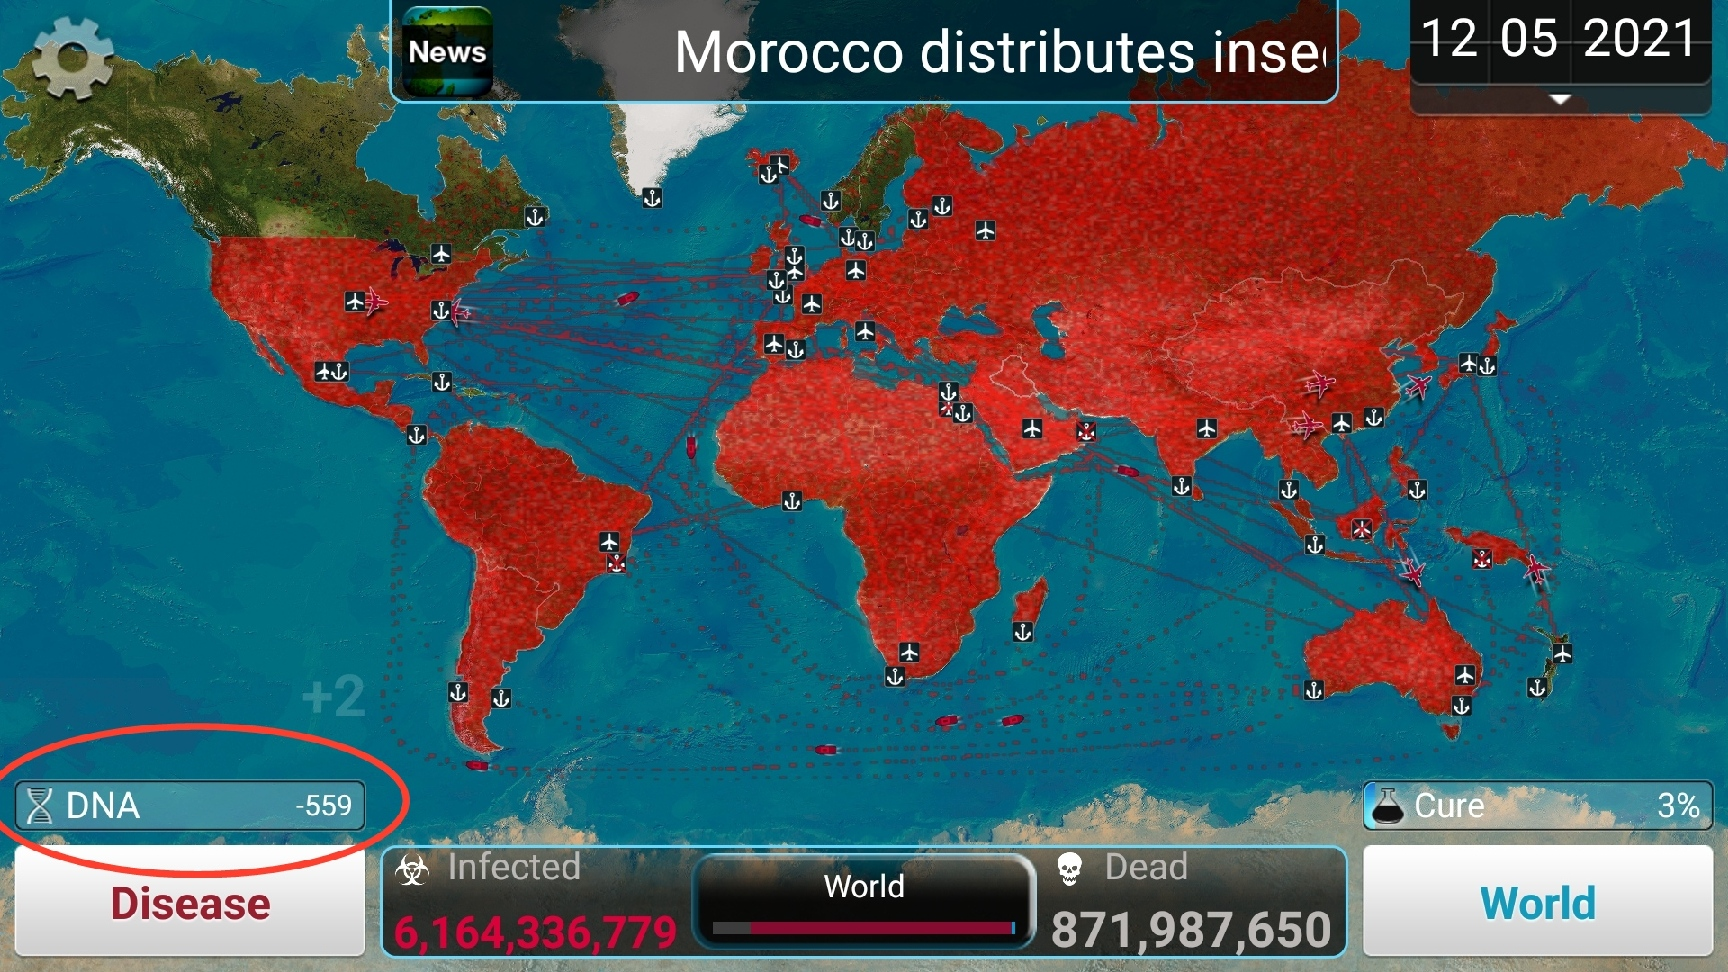 Plague Inc. Mod apk descargar - Plague Inc. Mod Apk 1.18.5 ...